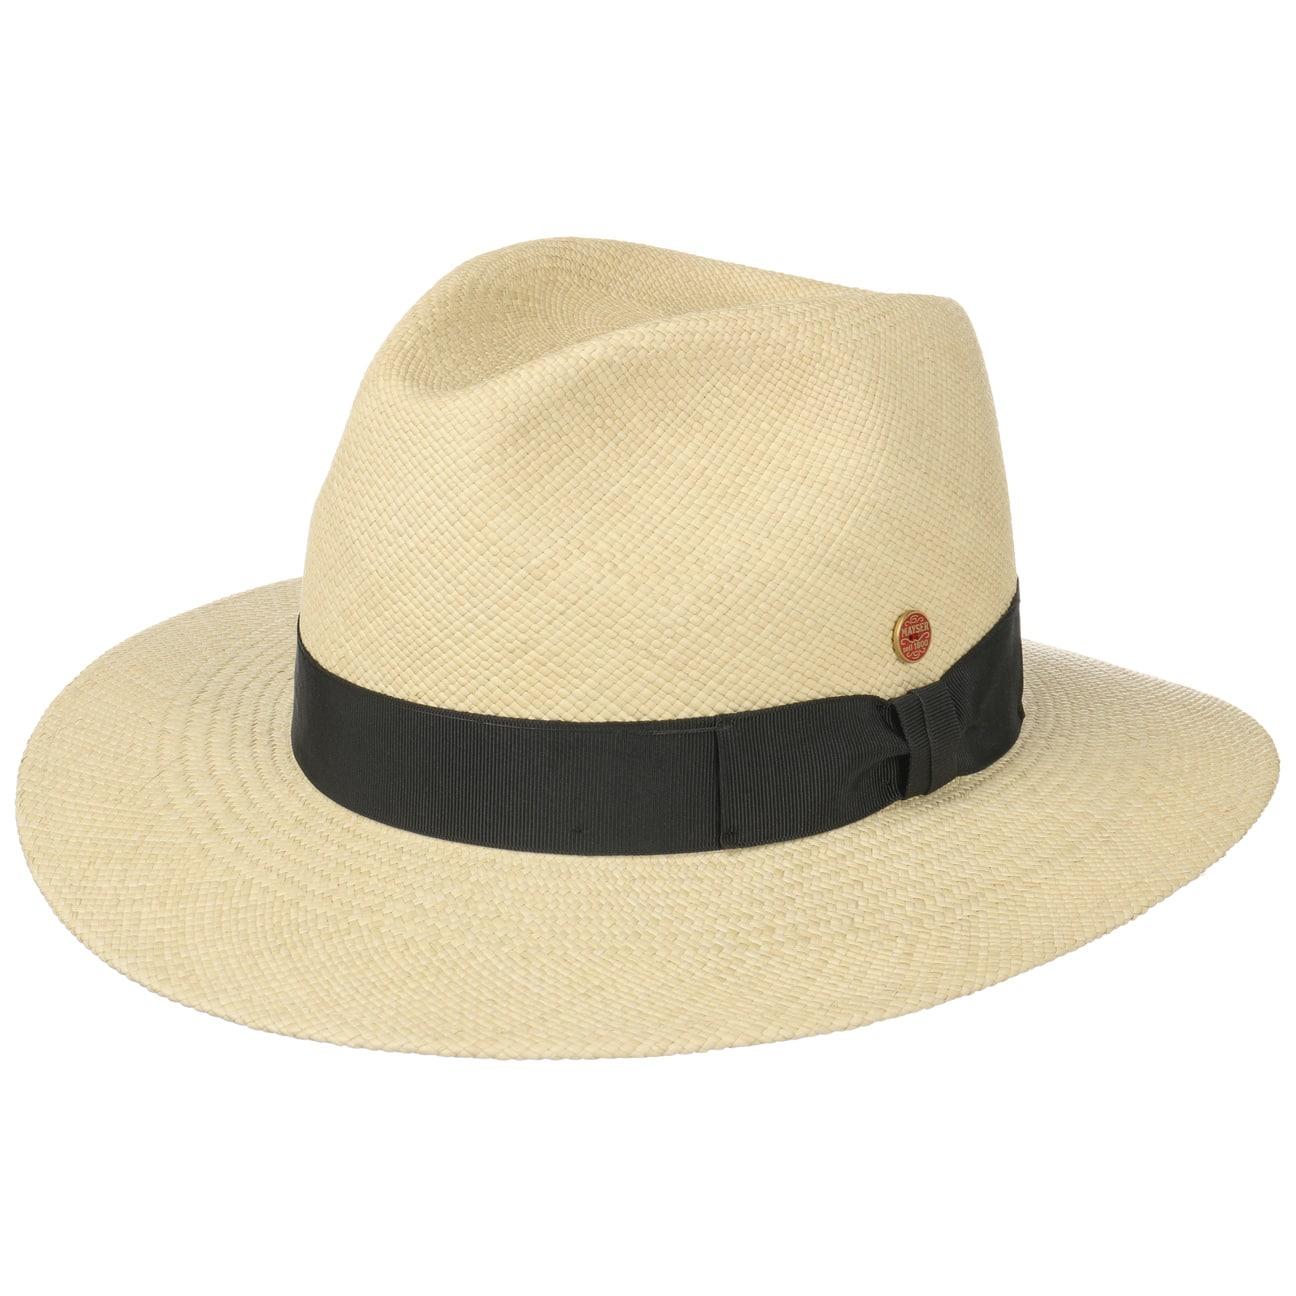 Sombrero Panama Menton by Mayser